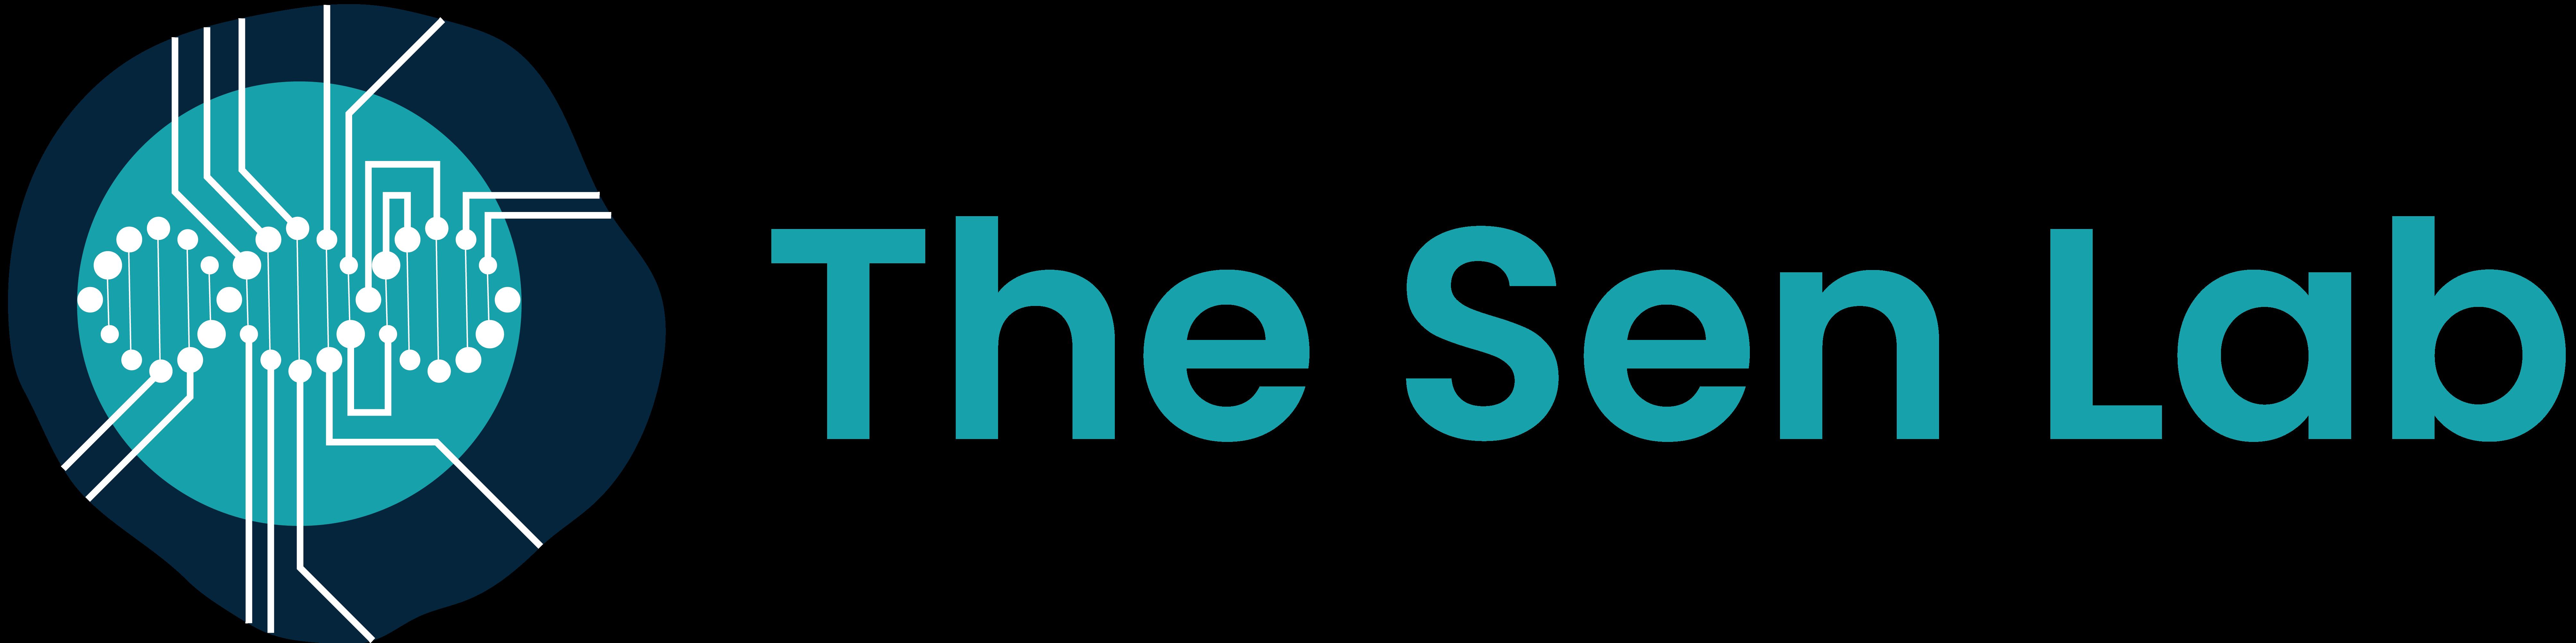 The Sen Lab